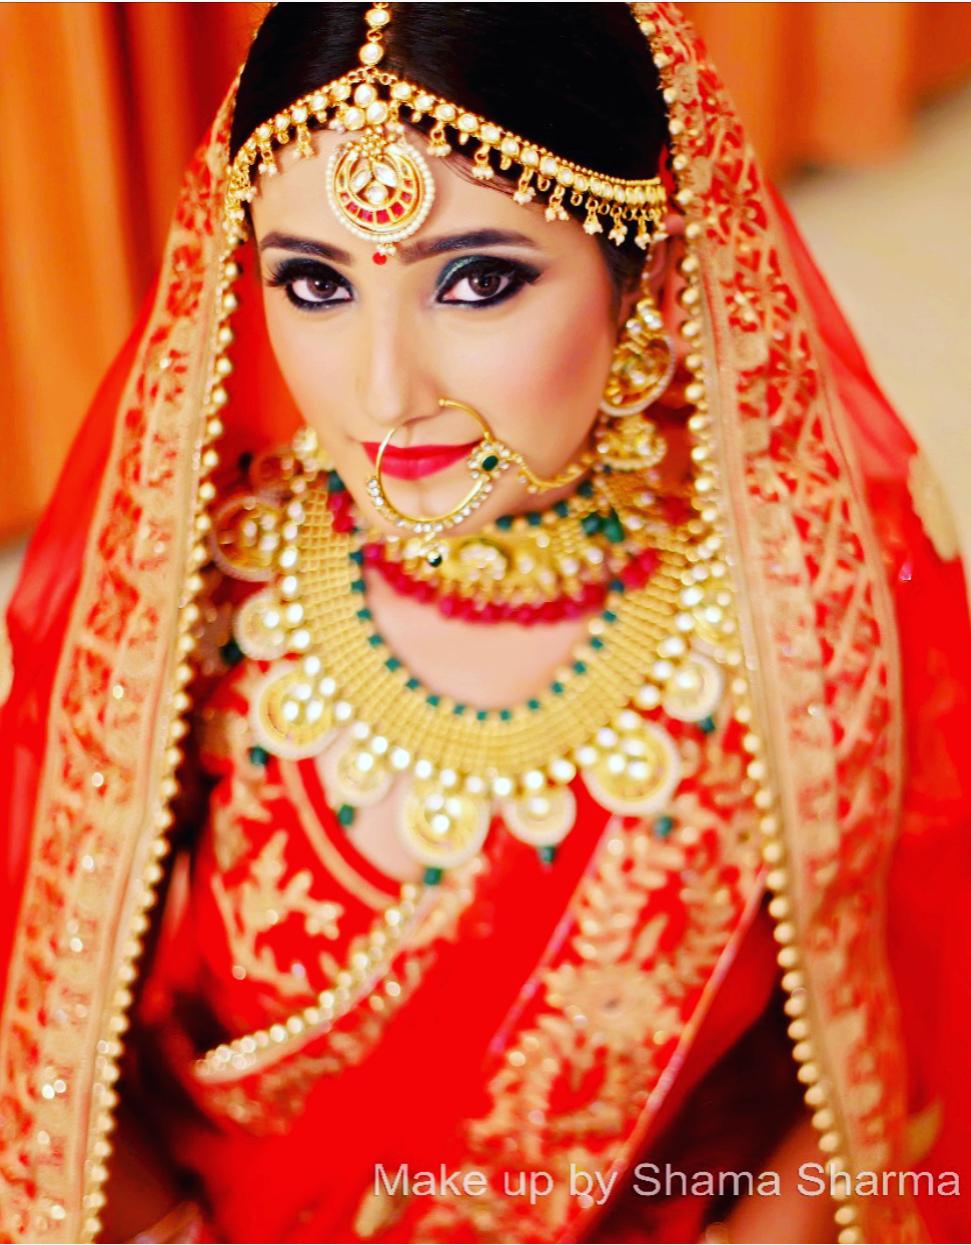 shama-sharma-makeup-artist-delhi-ncr